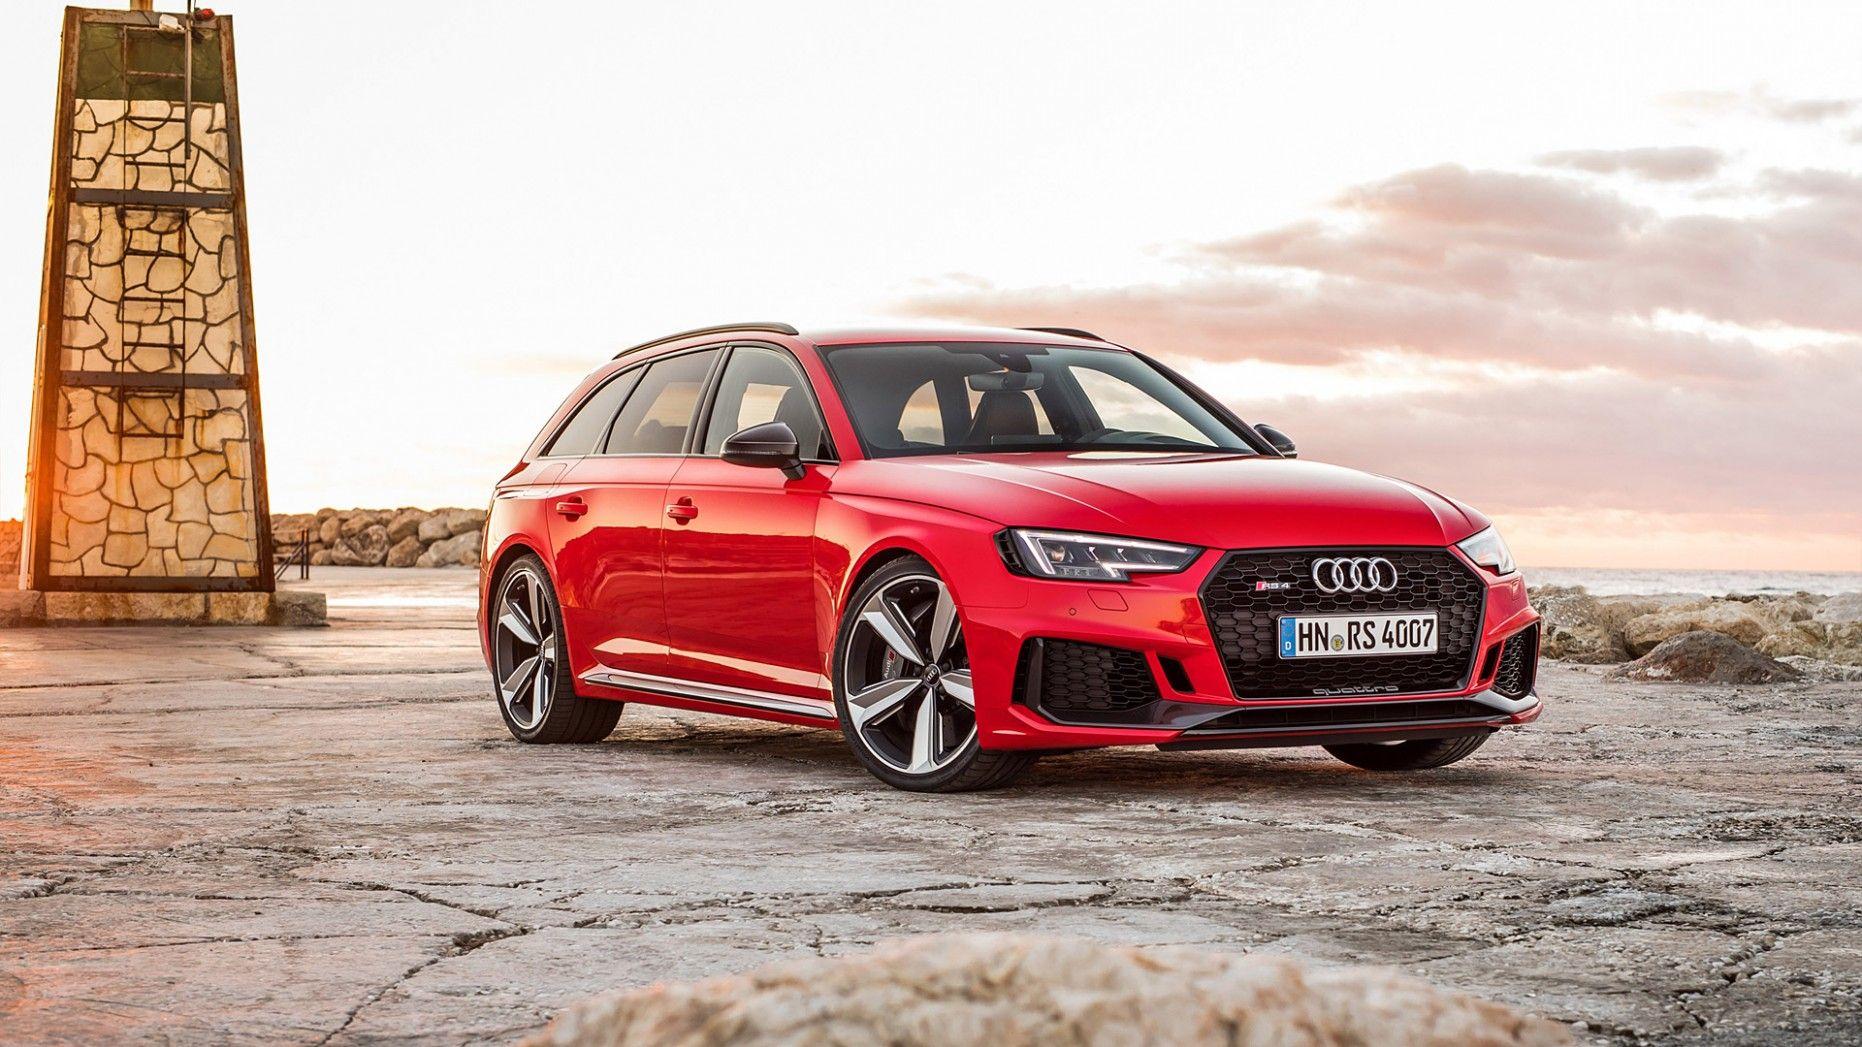 5 Quick Tips Regarding 2021 Audi Rs4 Design Audi Rs4 Audi Rs Red Sports Car